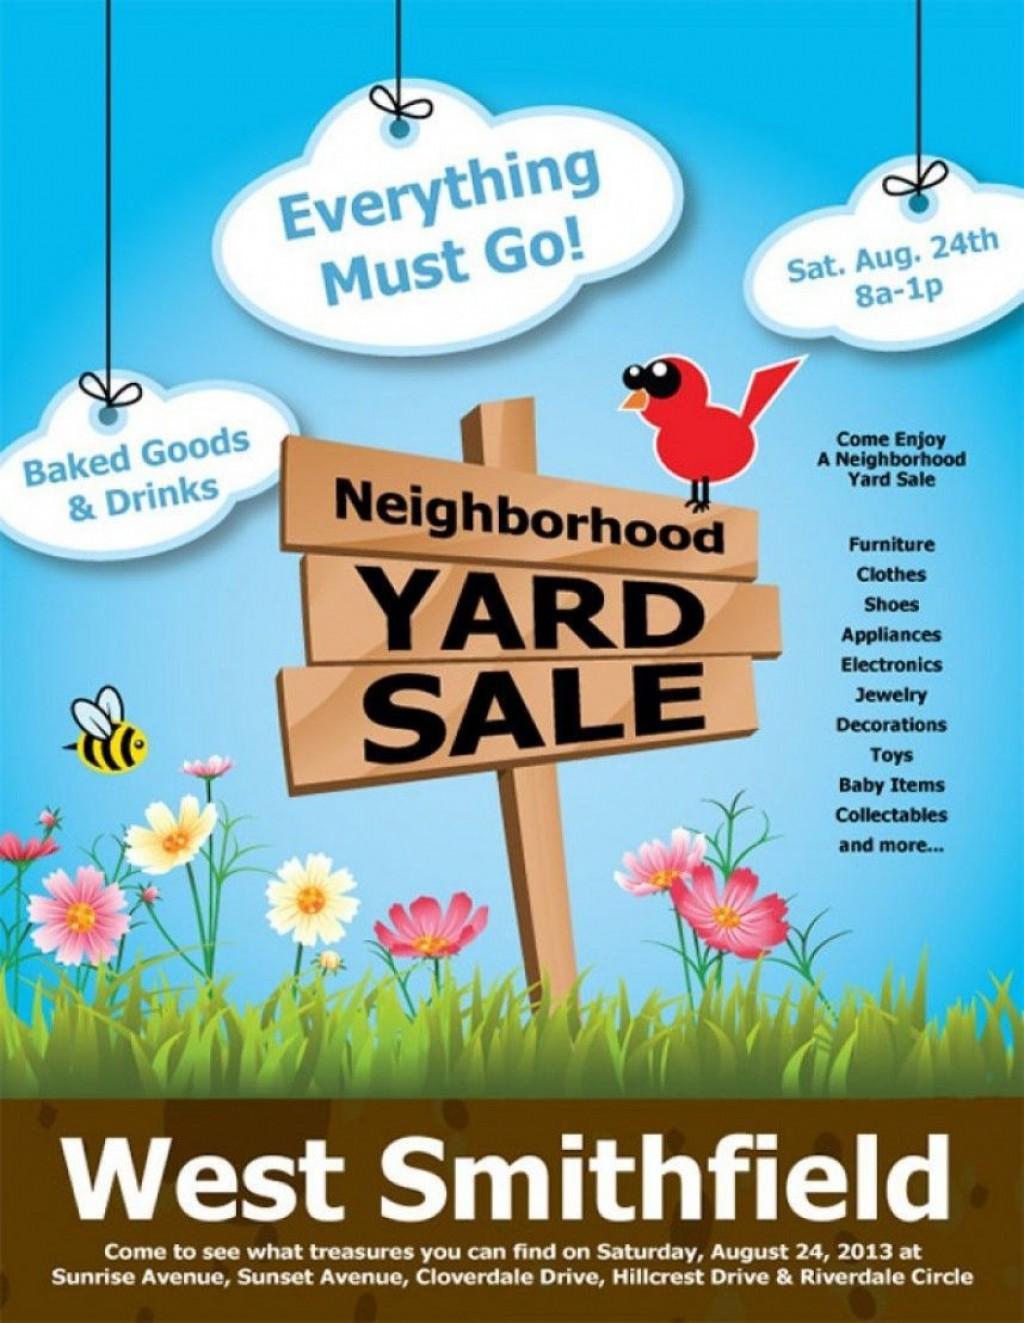 003 Phenomenal Garage Sale Flyer Template Free Design  Community Neighborhood YardLarge